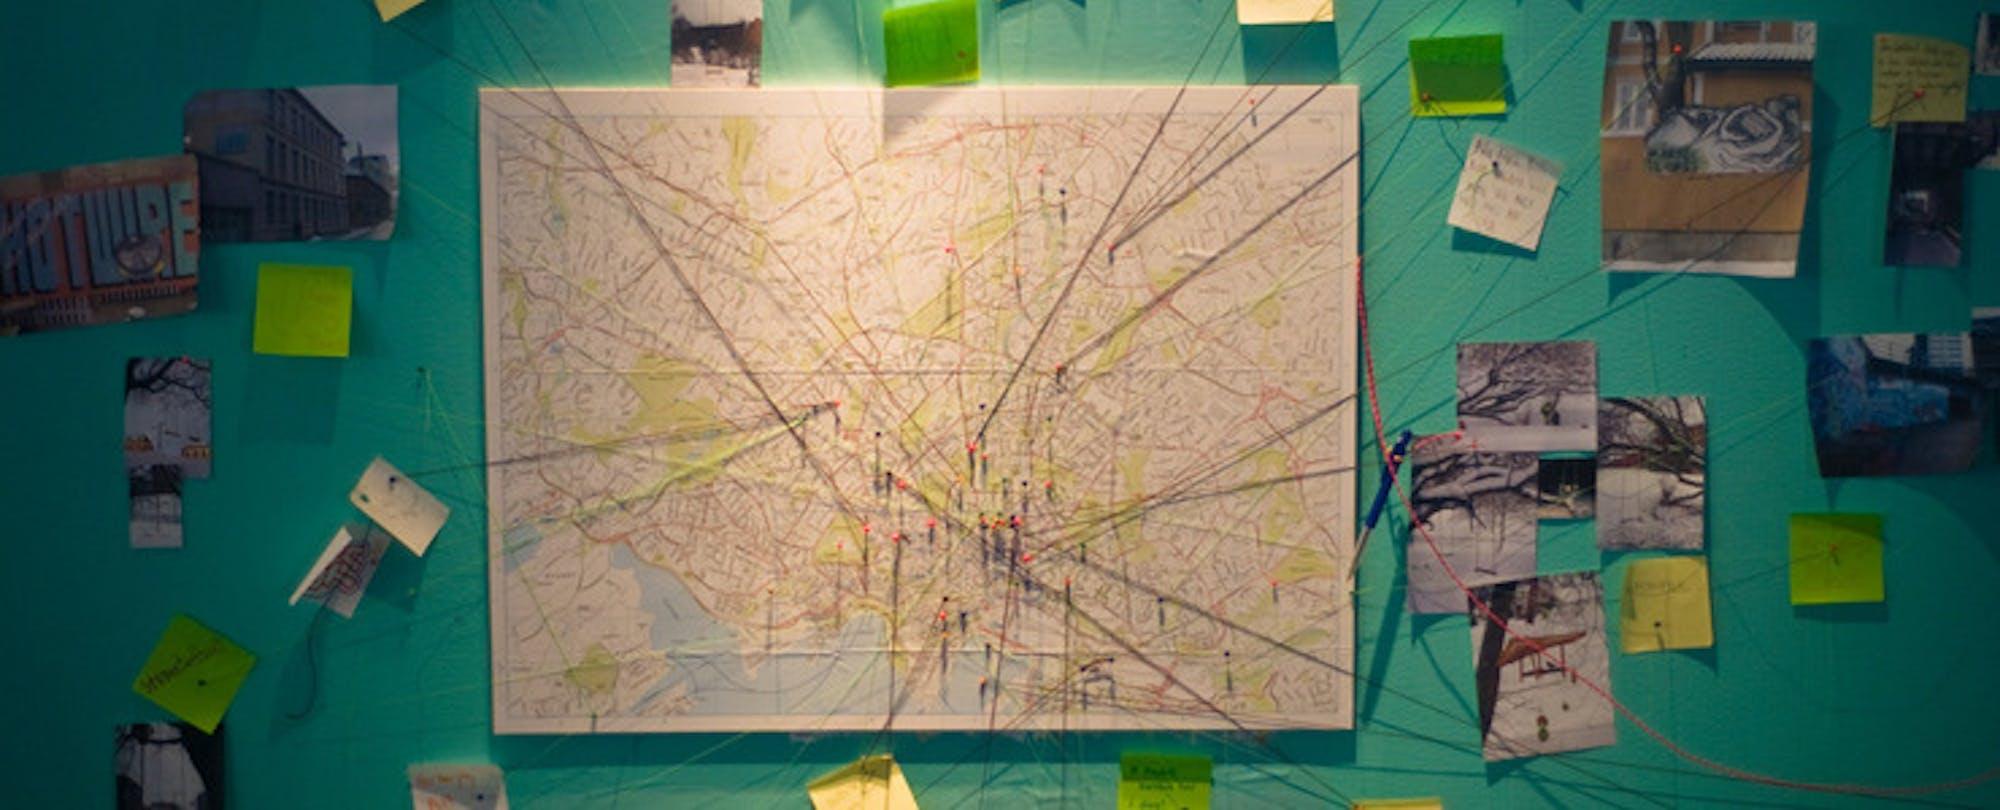 A New Look at the EdSurge Edtech Market Map